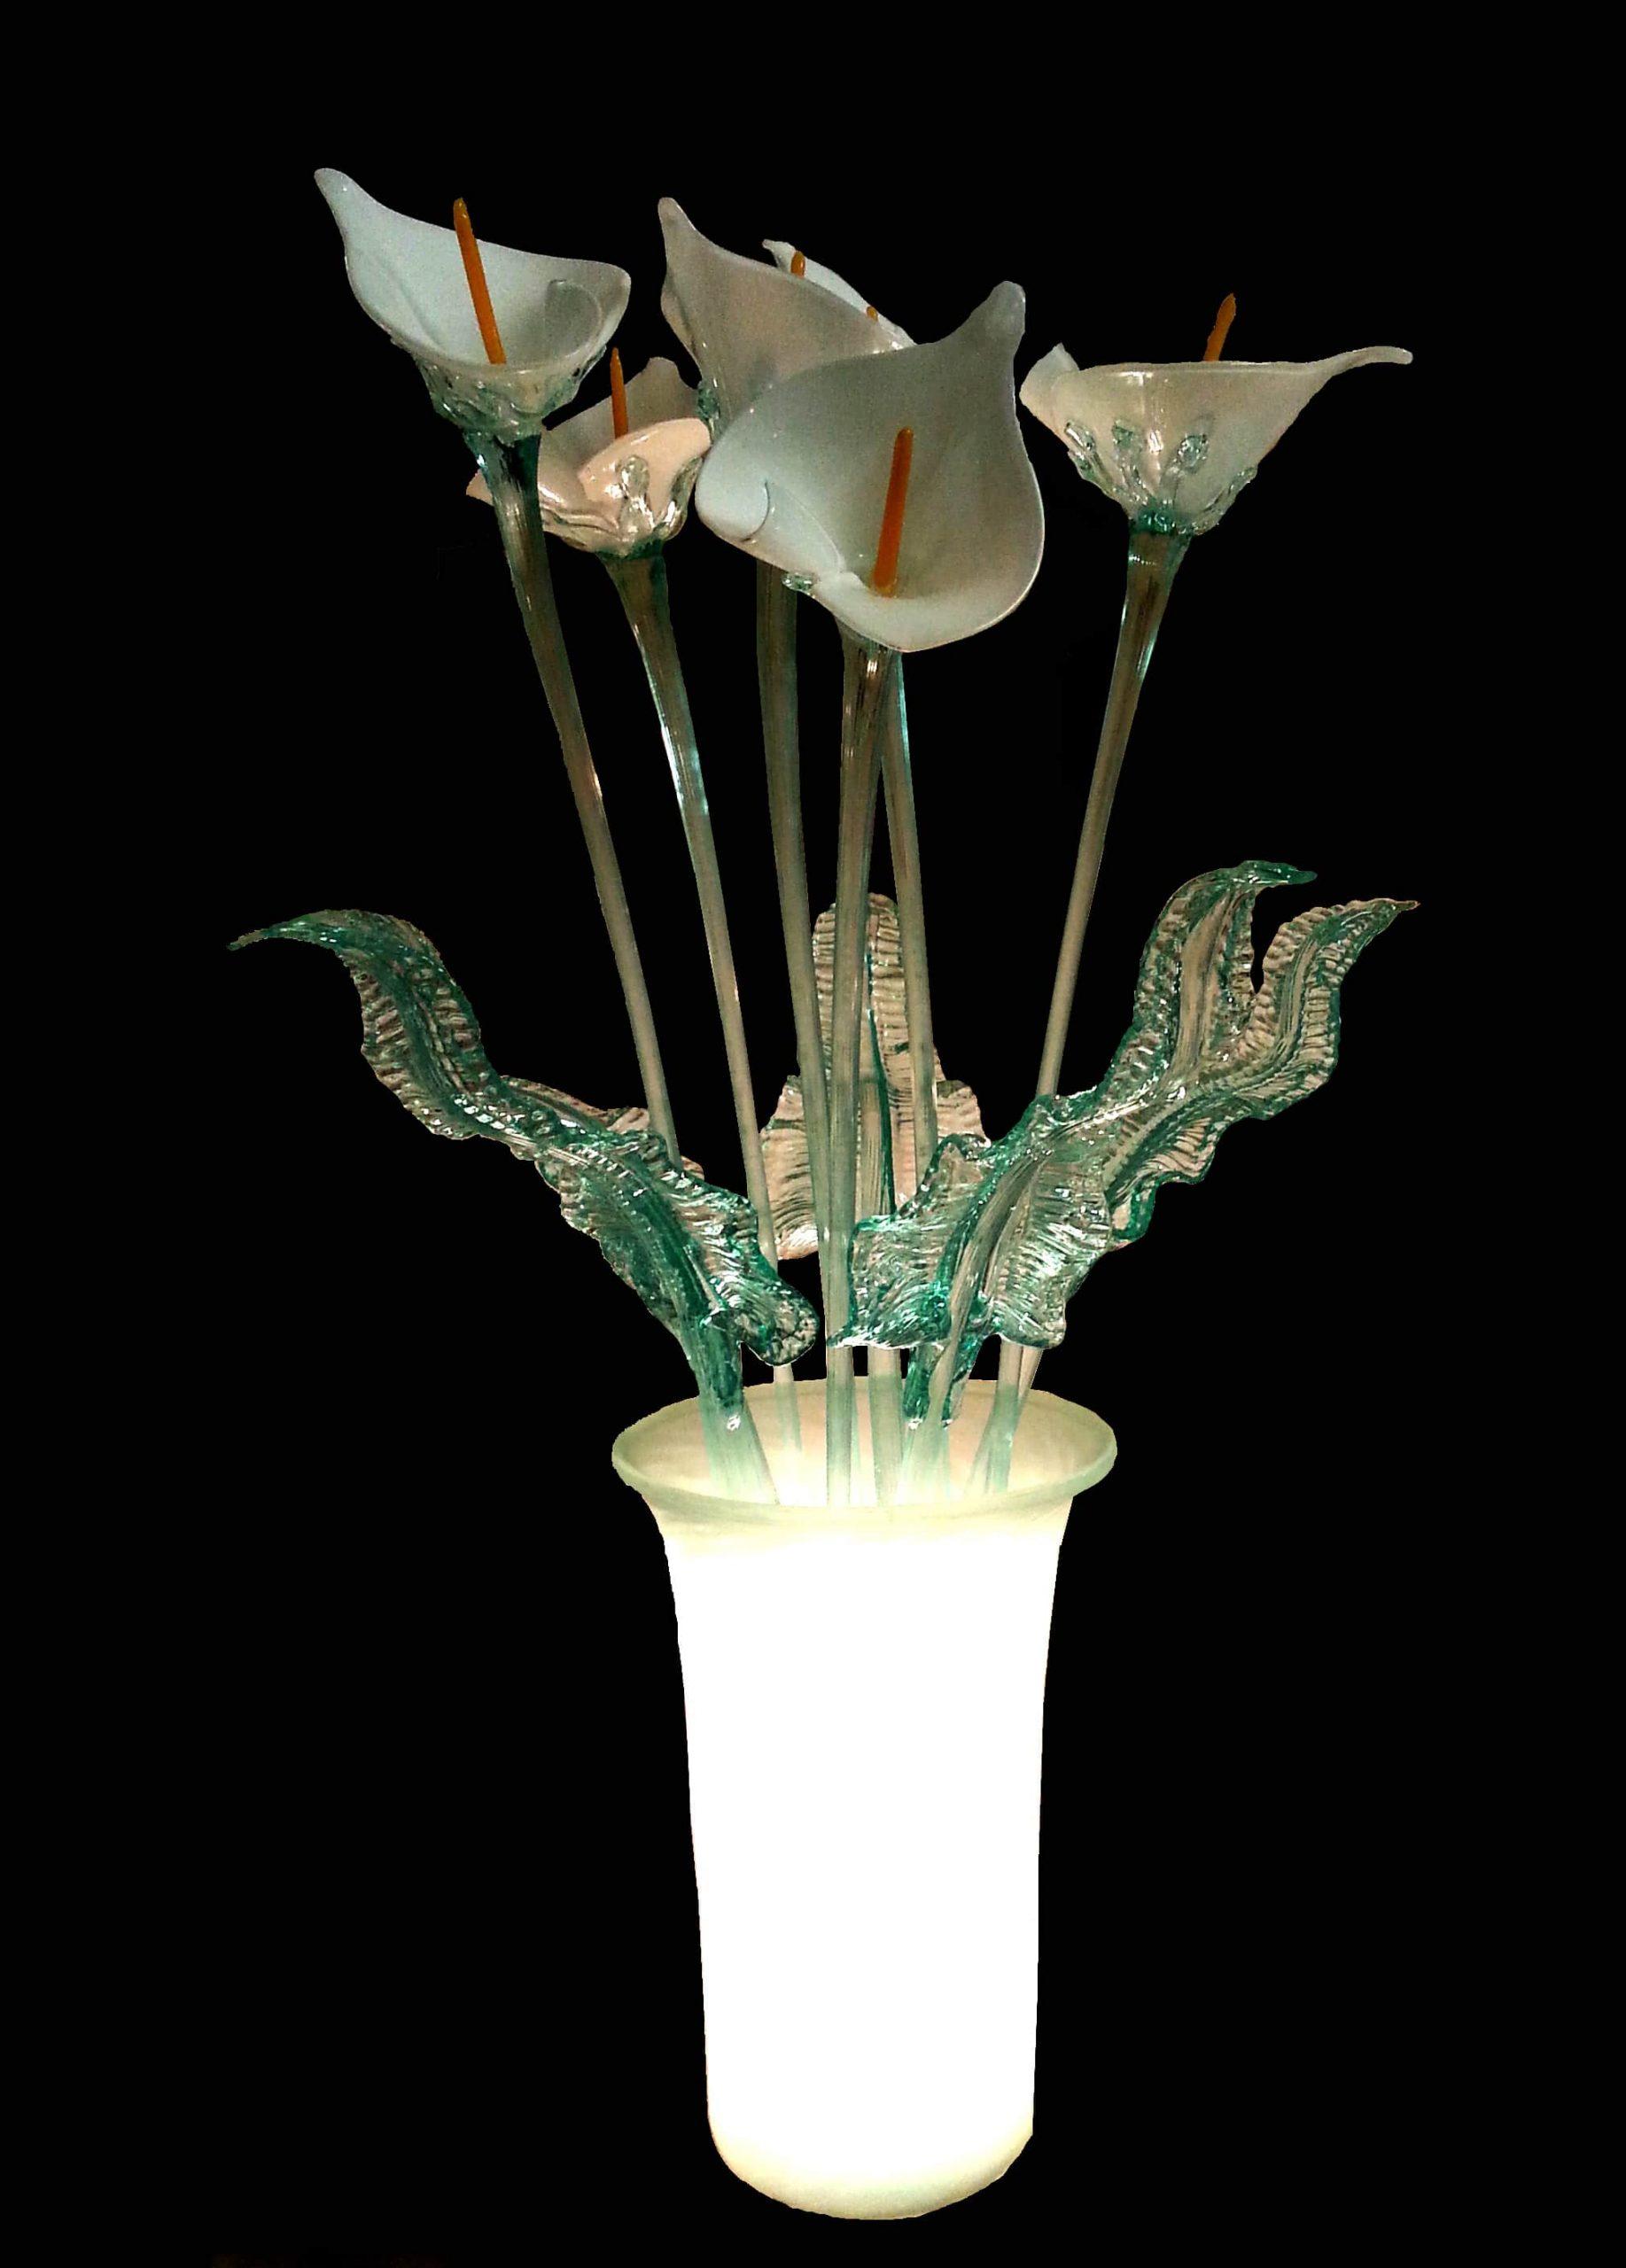 Vaso lampada Calle bianche